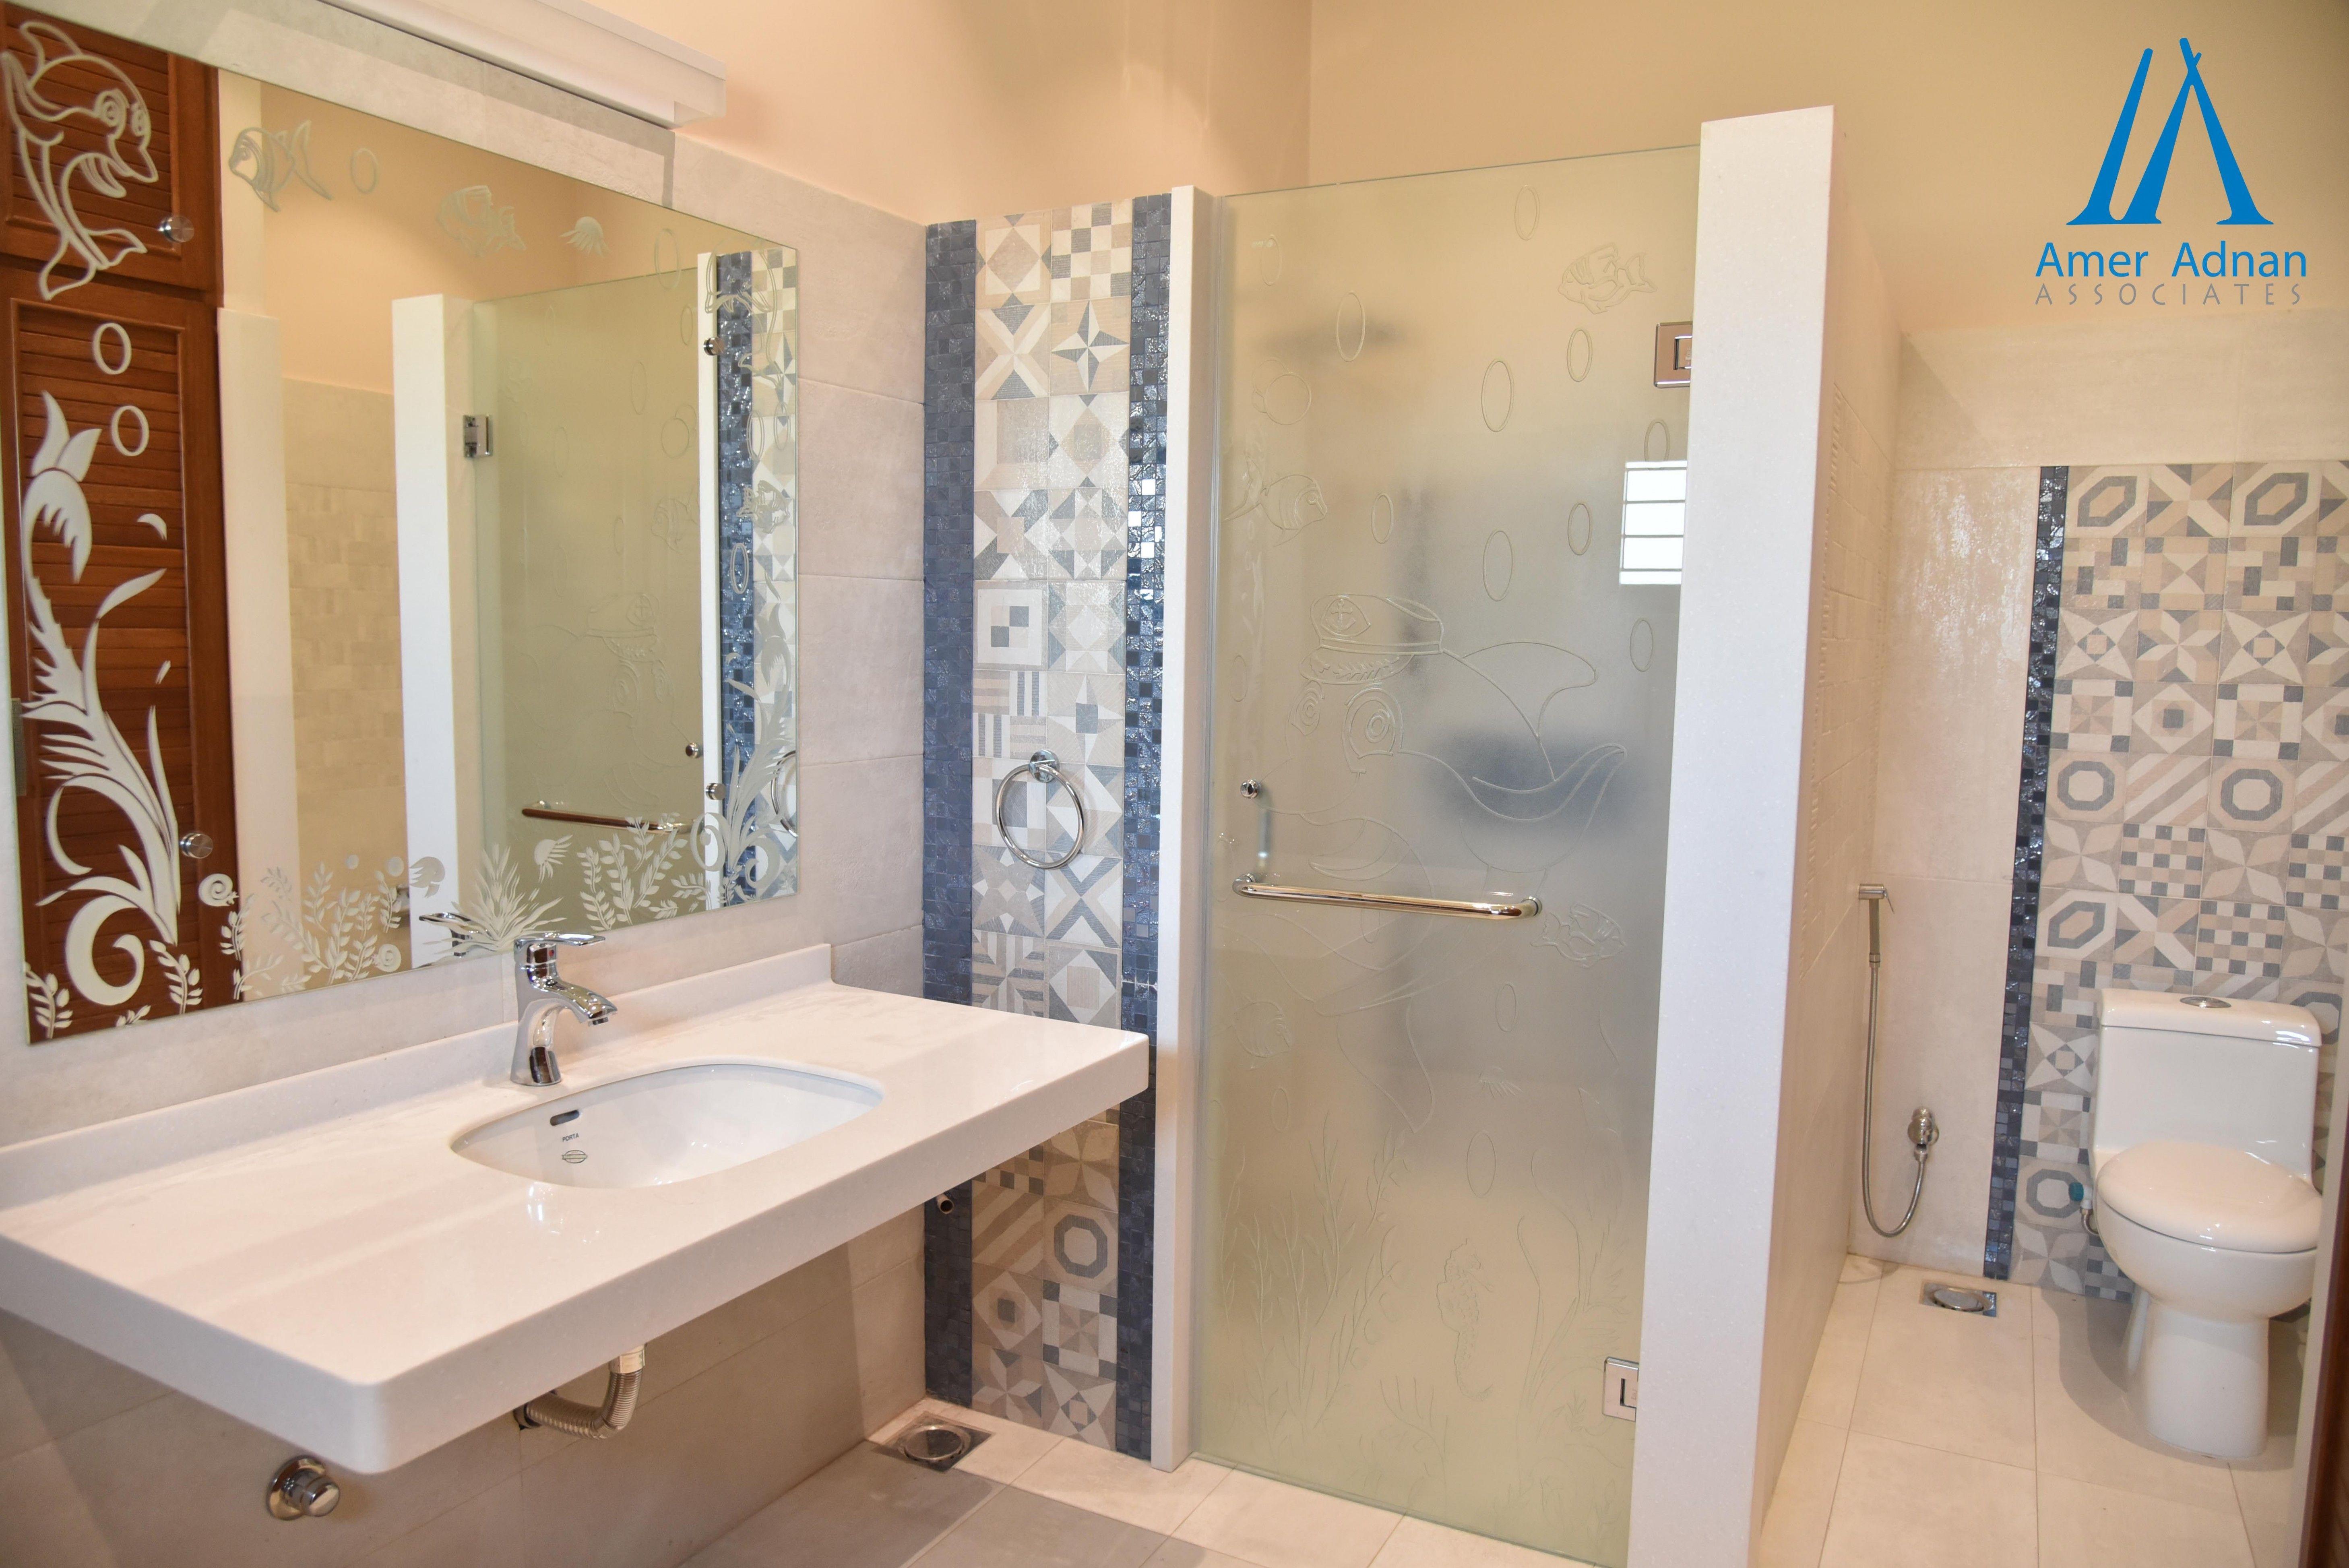 The Shocking Revelation Of Small Bathroom Design Pakistan In 2020 Bathroom Design Latest Bathroom Designs Small Bathroom Design